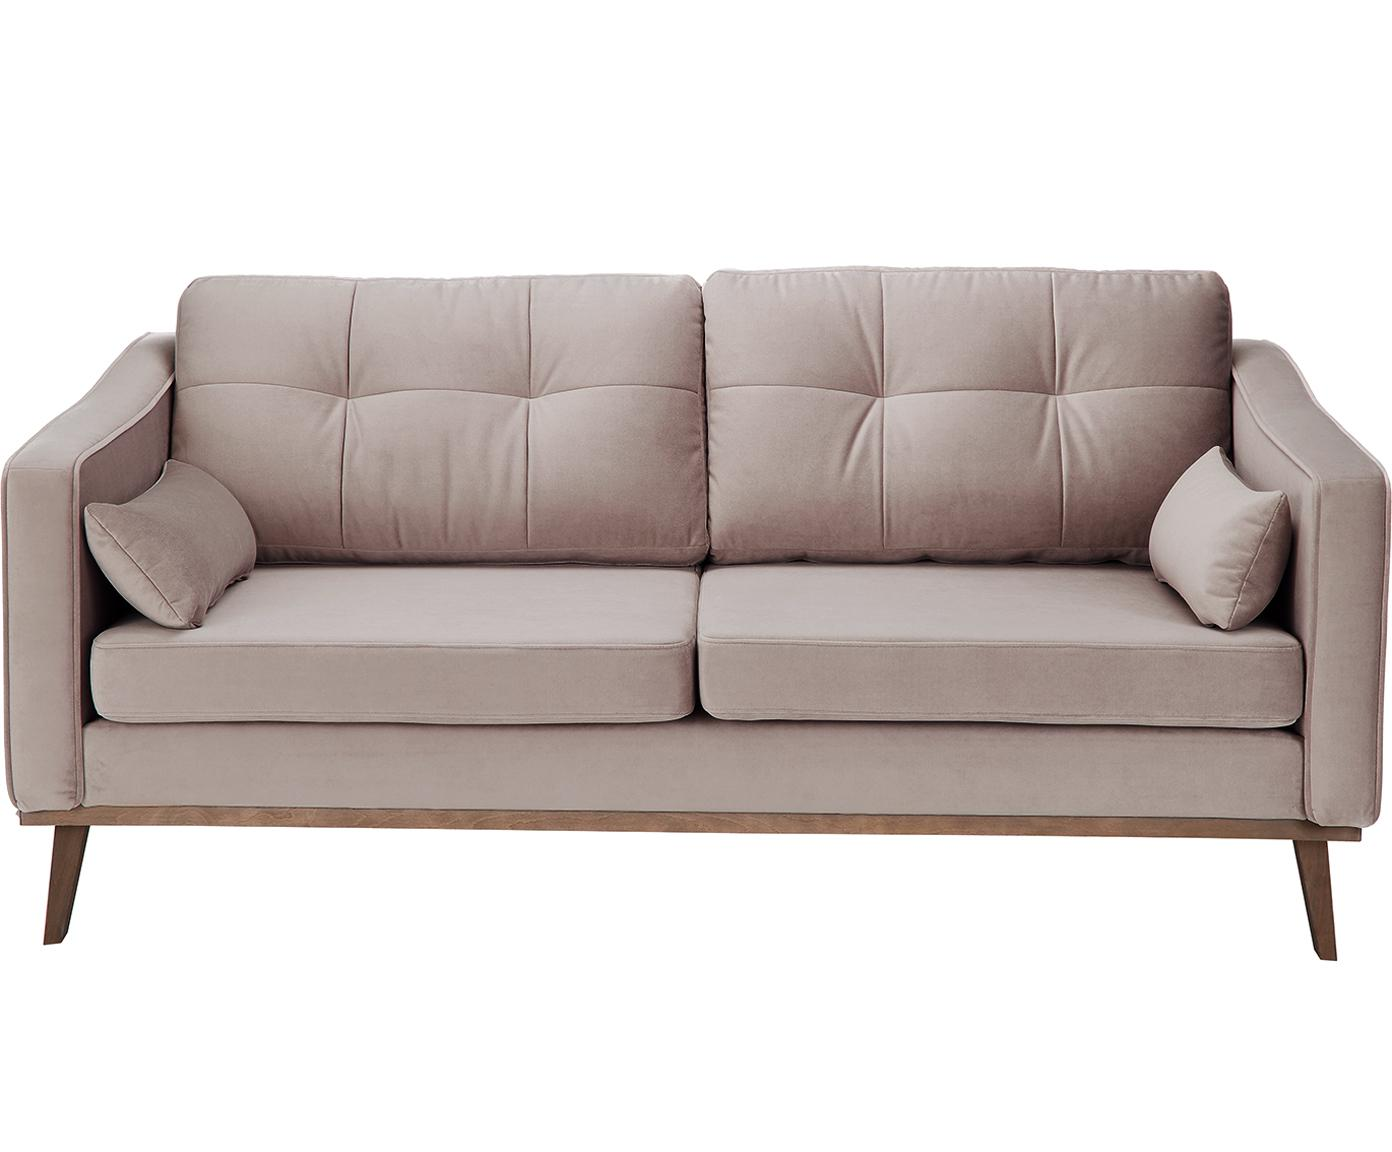 Samt-Sofa Alva (2-Sitzer), Bezug: Samt (Hochwertiger Polyes, Gestell: Massives Kiefernholz, Samt Taupe, B 184 x T 92 cm